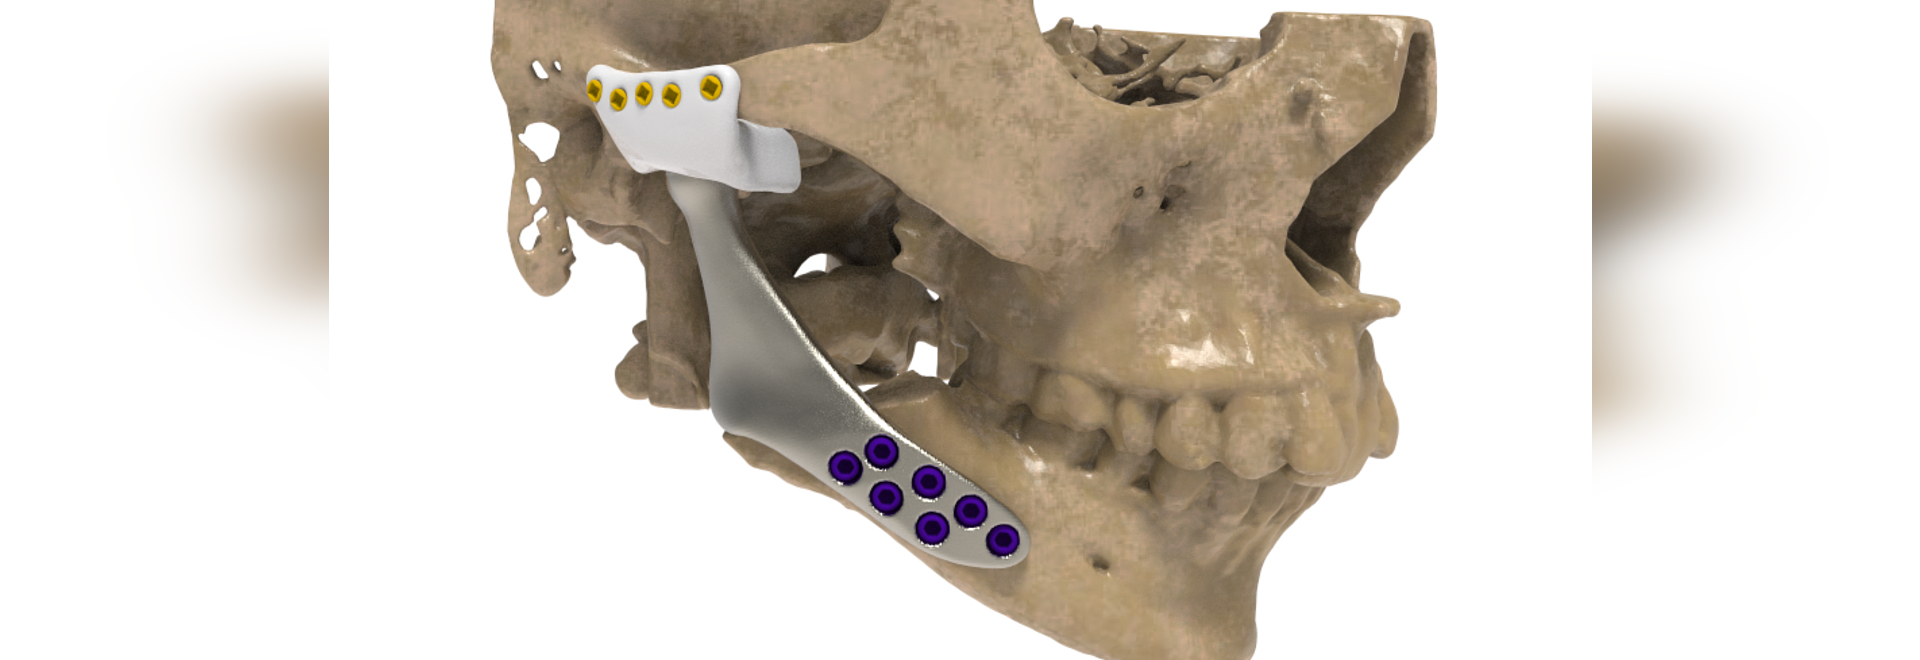 Unilateral patient-specific temporomandibular joint replacement